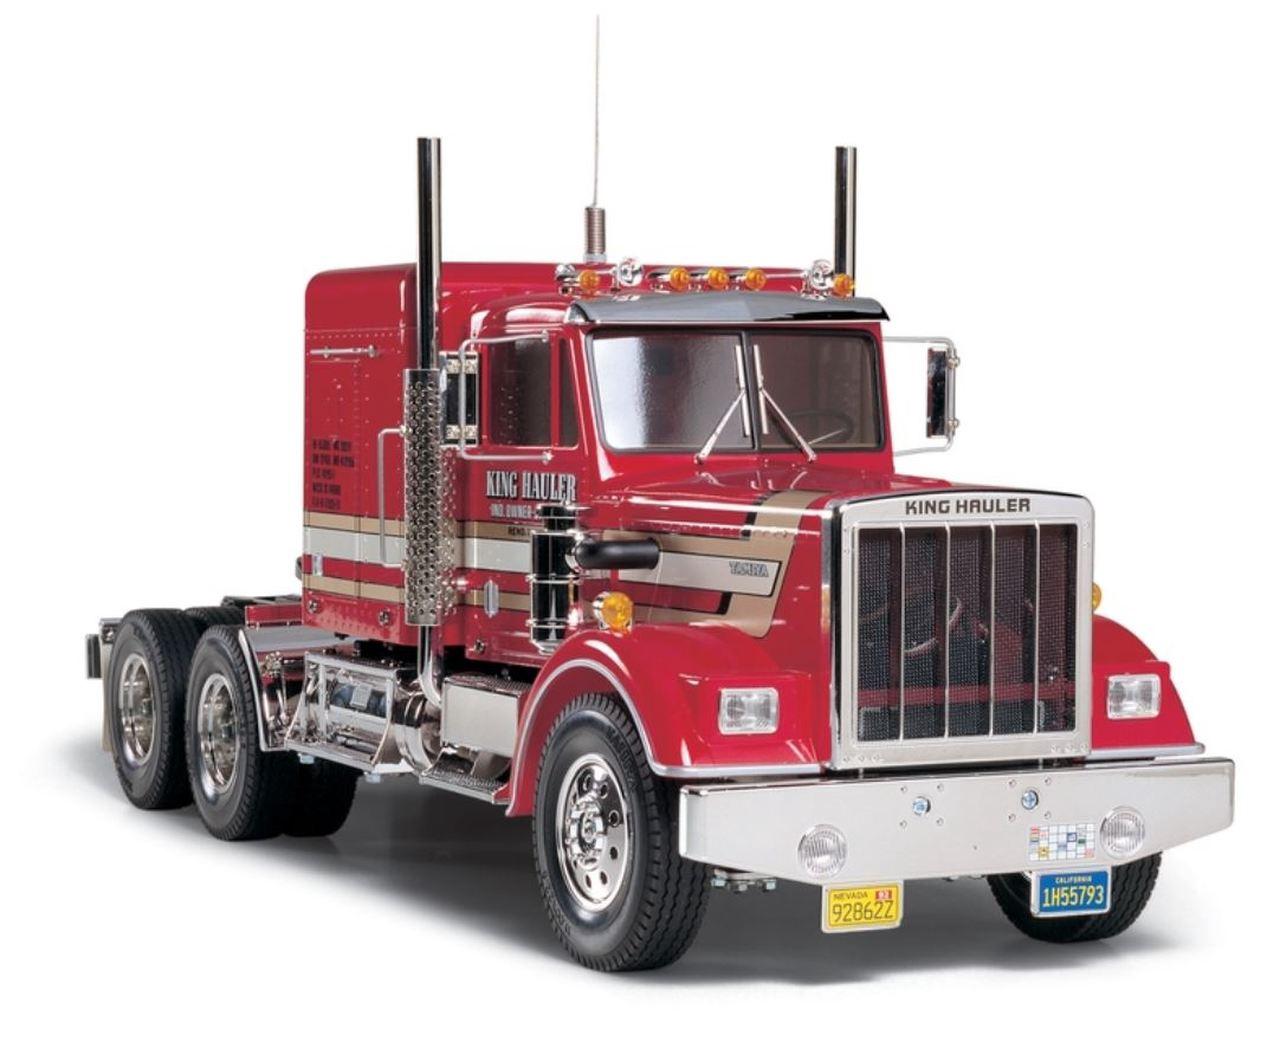 Tamiya #56301 1/14 King Hauler Truck